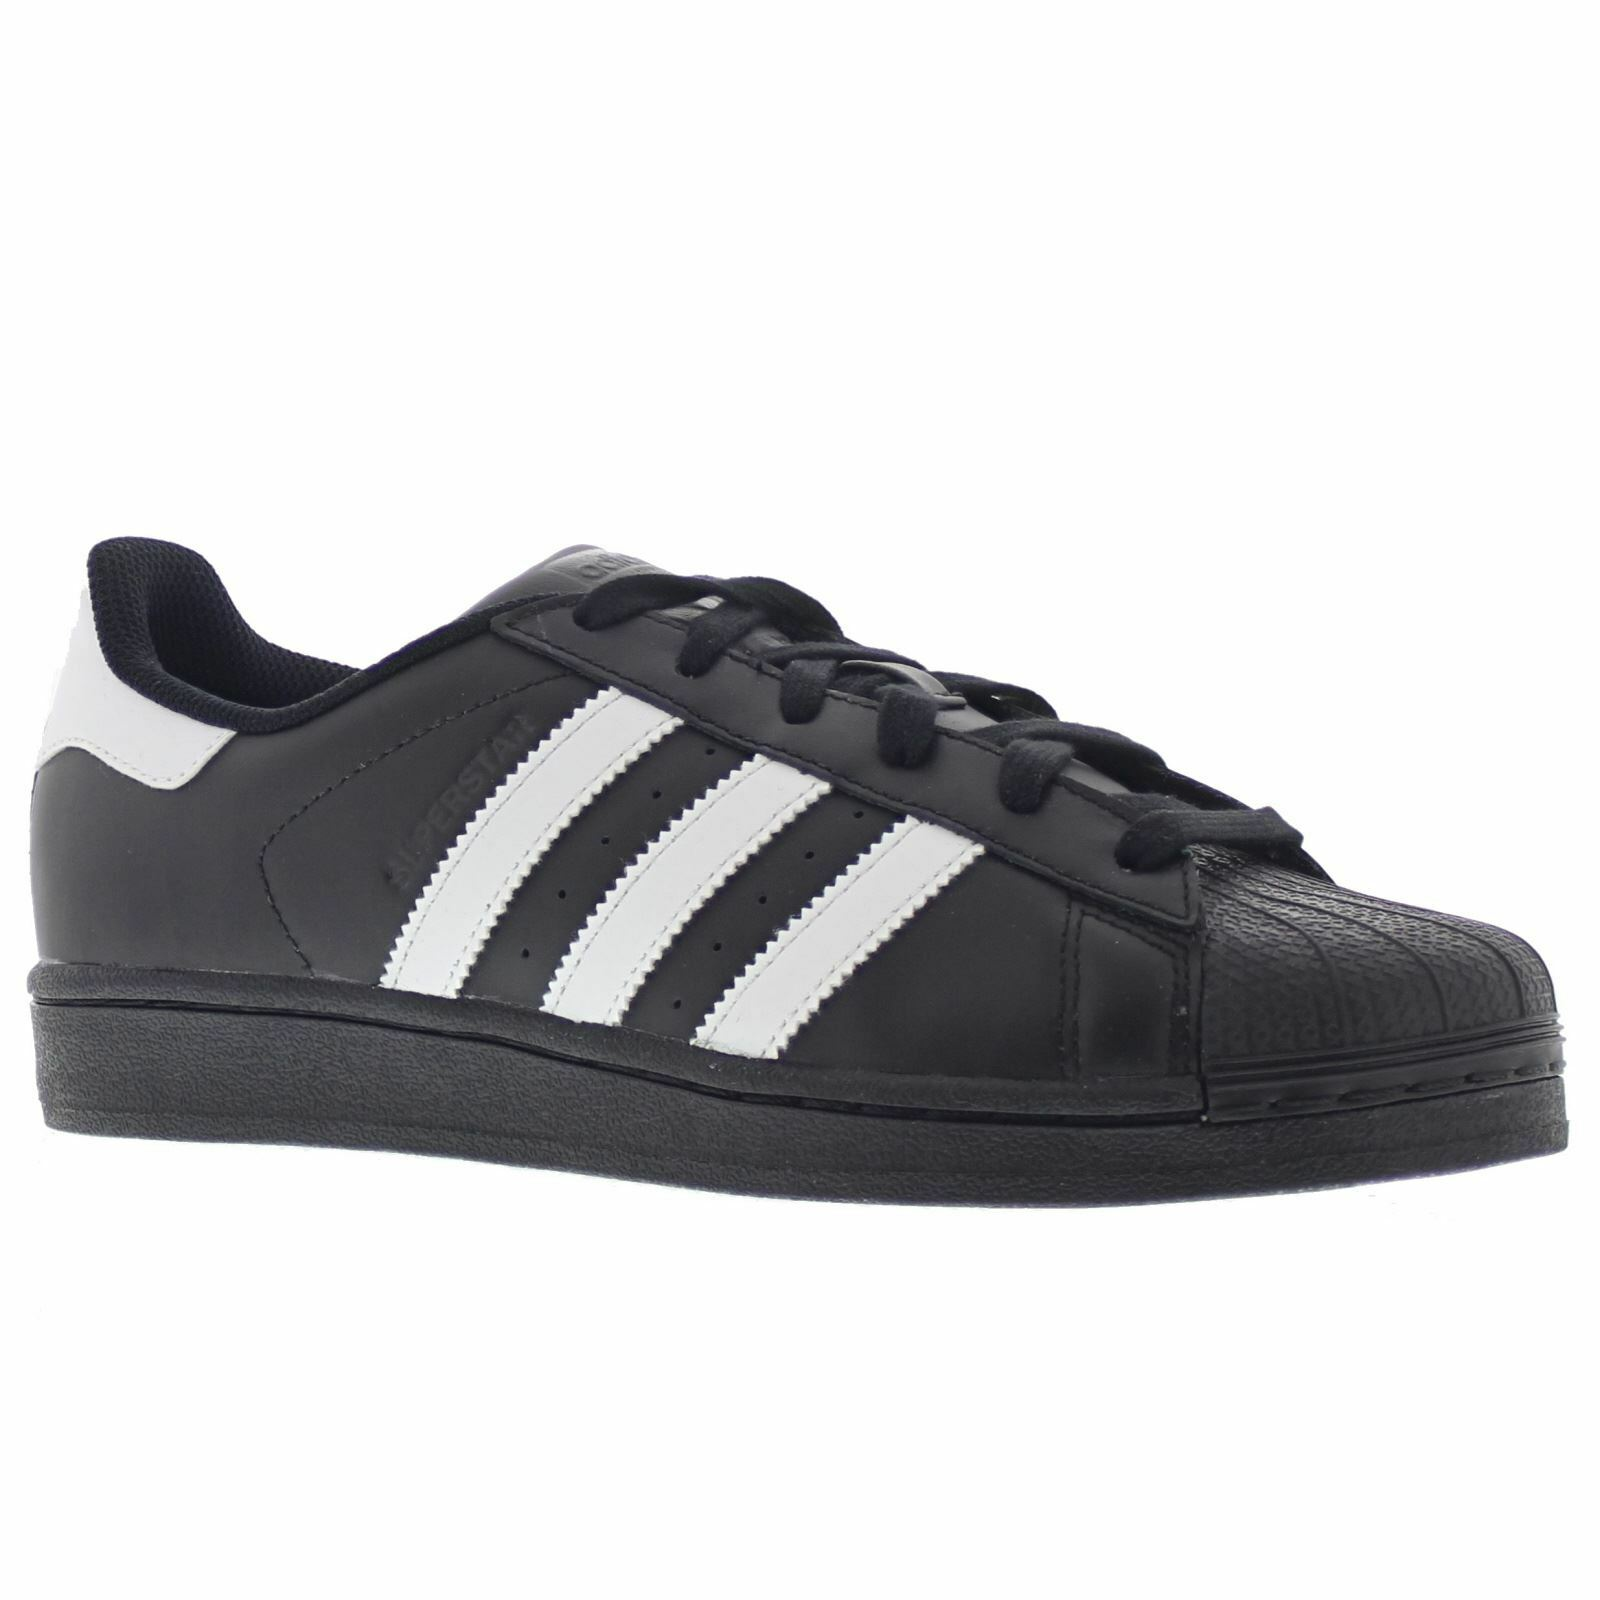 Adidas Superstar Foundation Black White Men's Trainers